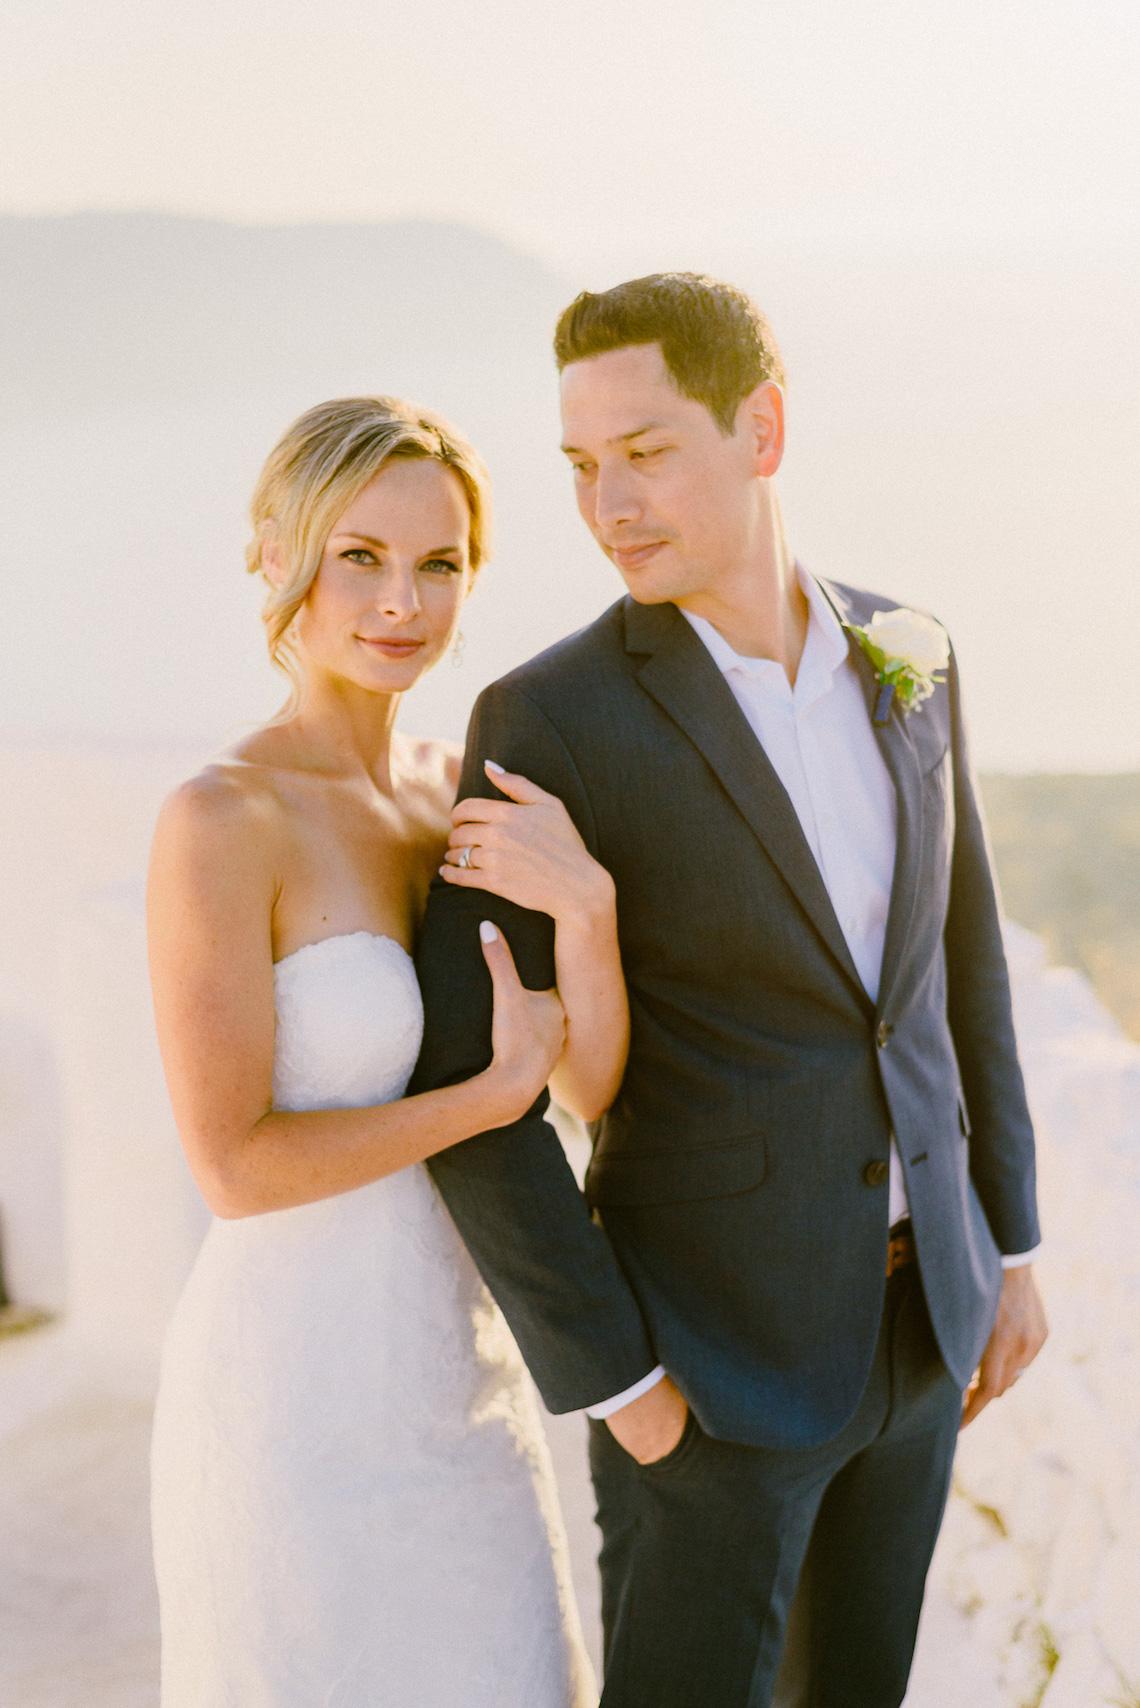 Classy Santorini Destination Wedding (With Amazing Caldera Views!) | Elias Kordelakos 24